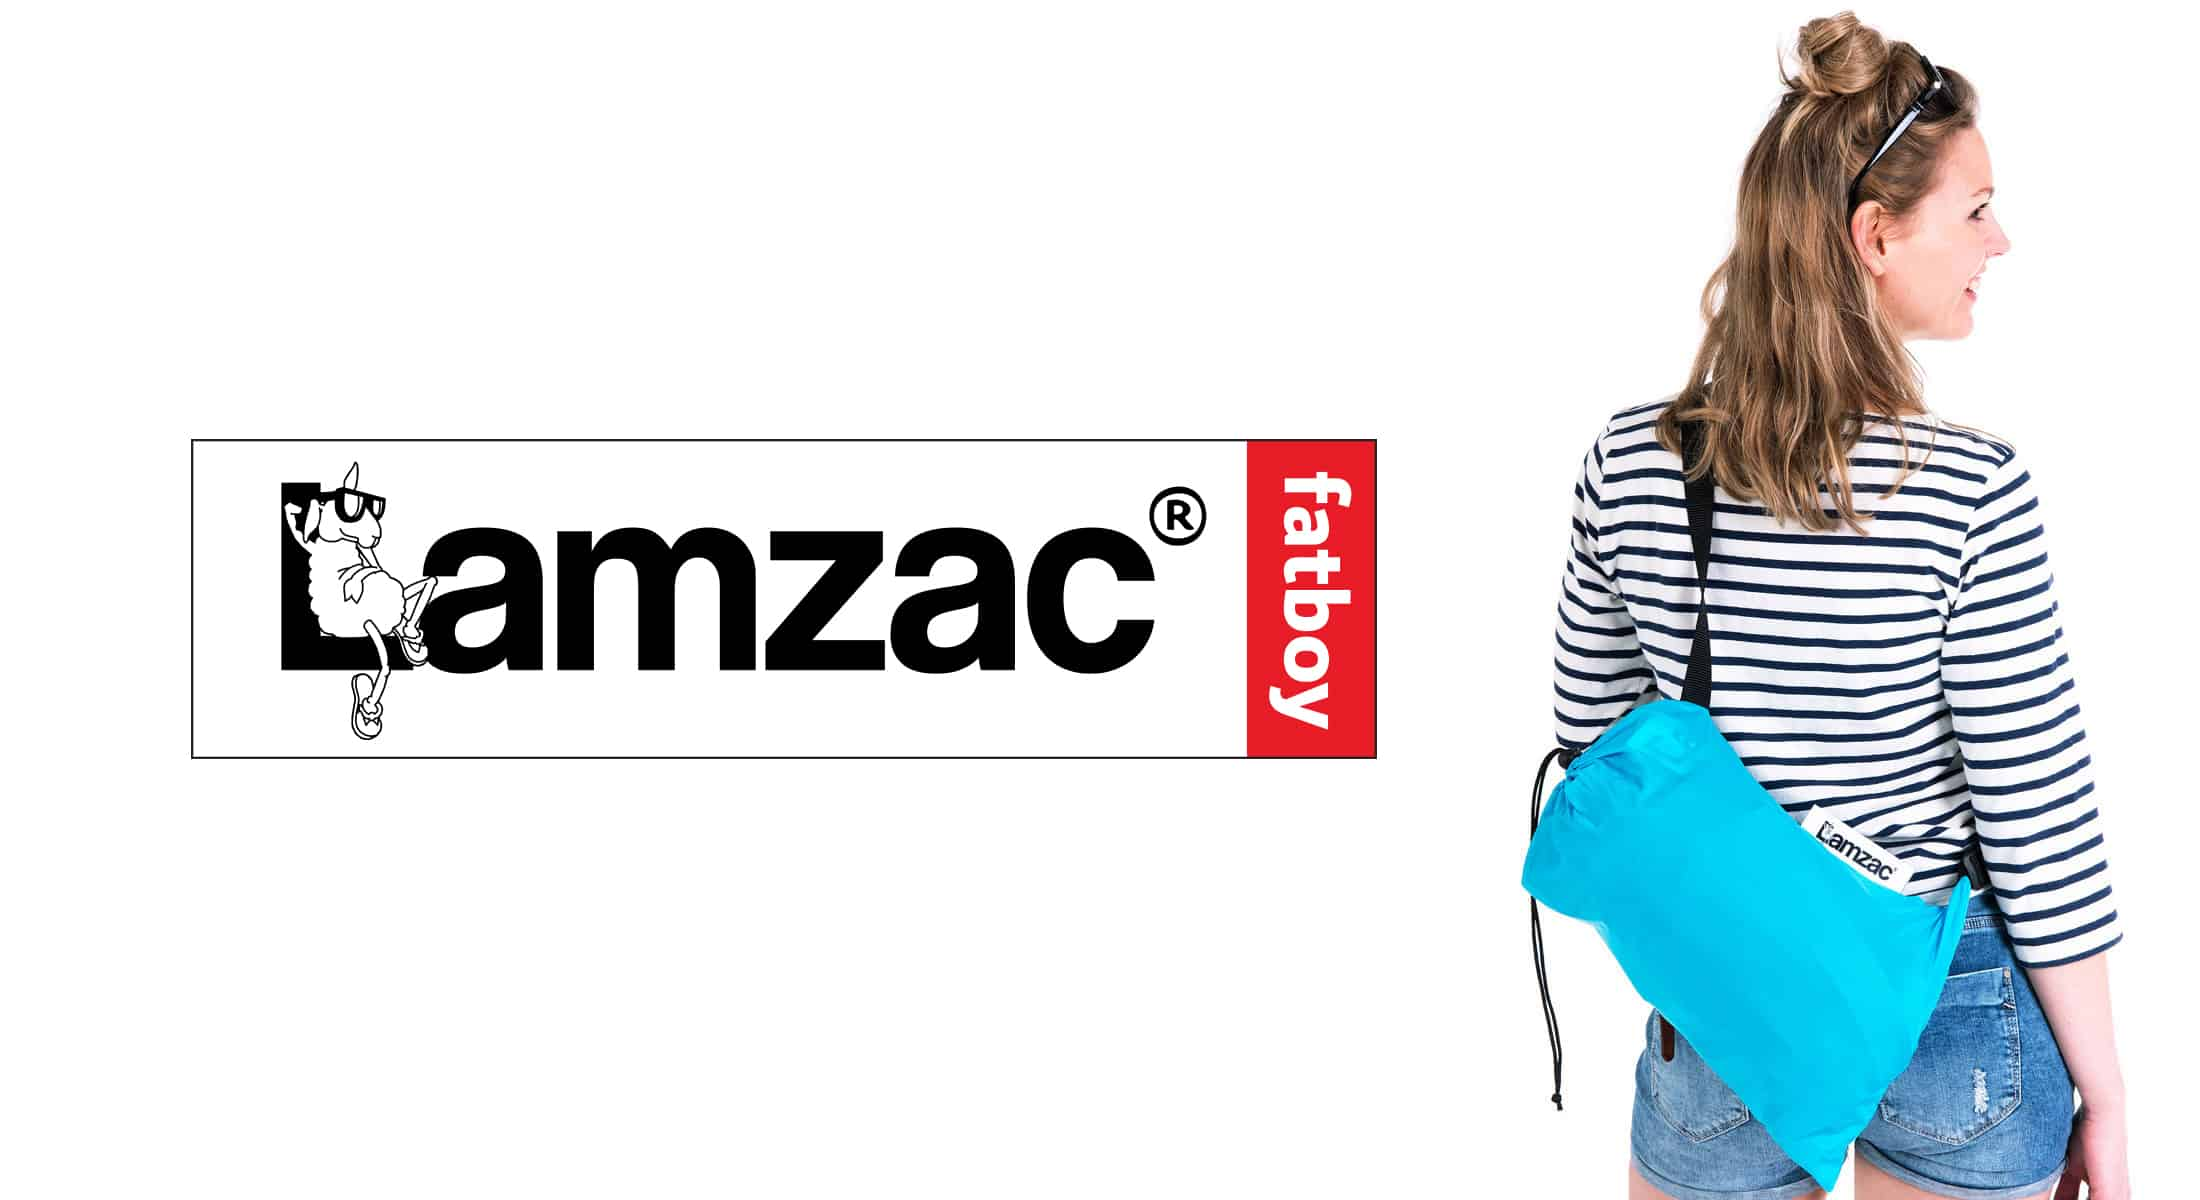 fatboy-lamzac-backpackmodel_tab_v3